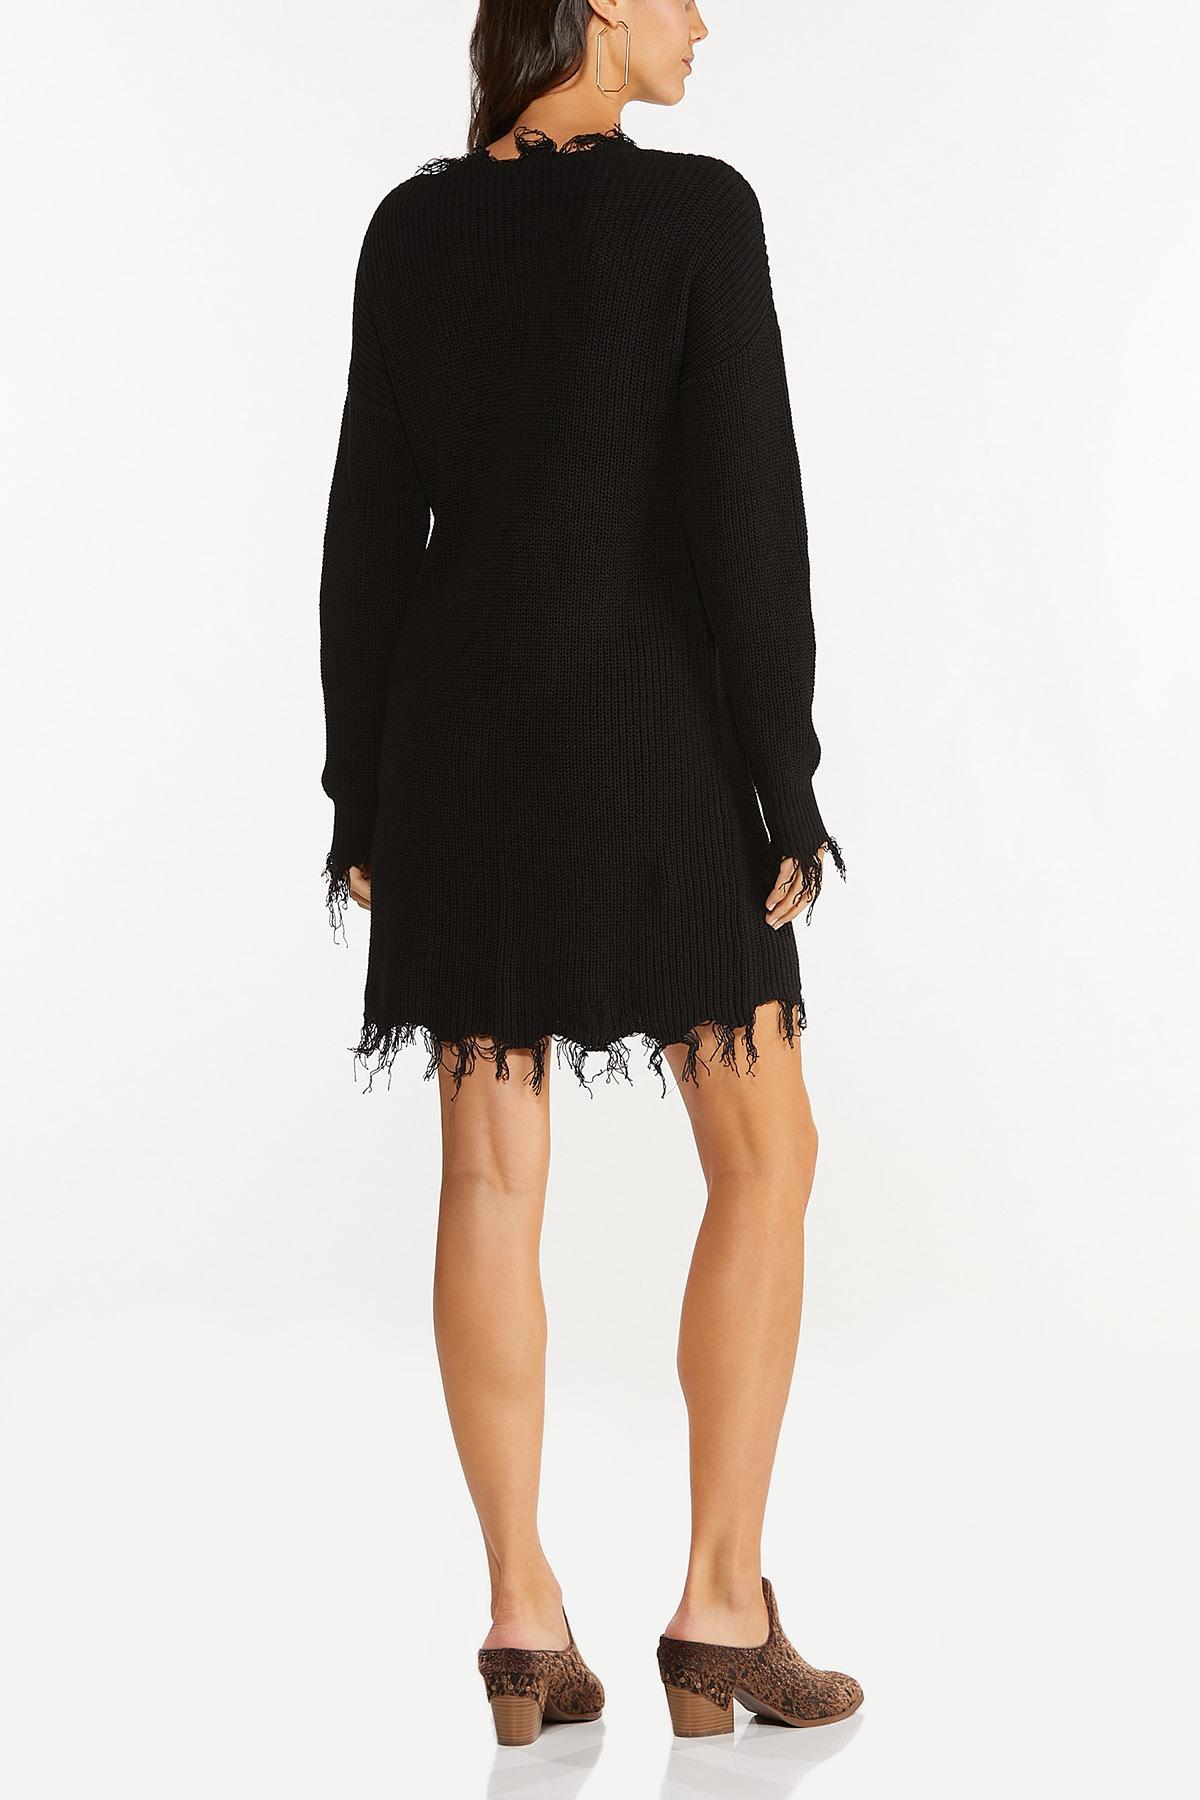 Plus Size Frayed Sweater Dress (Item #44714332)